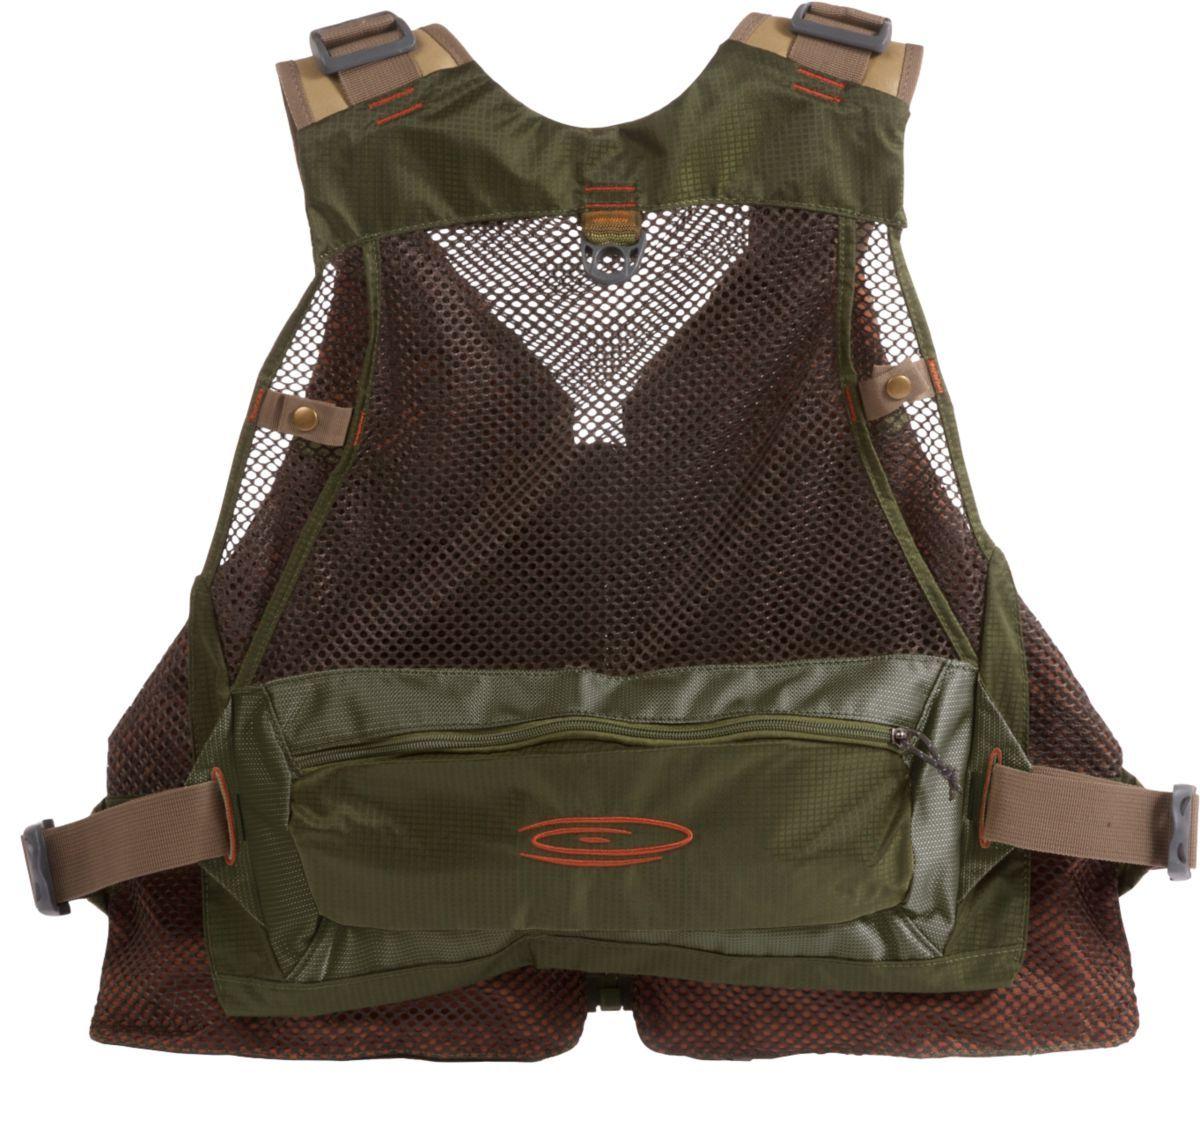 fishpond Gore Range Vest